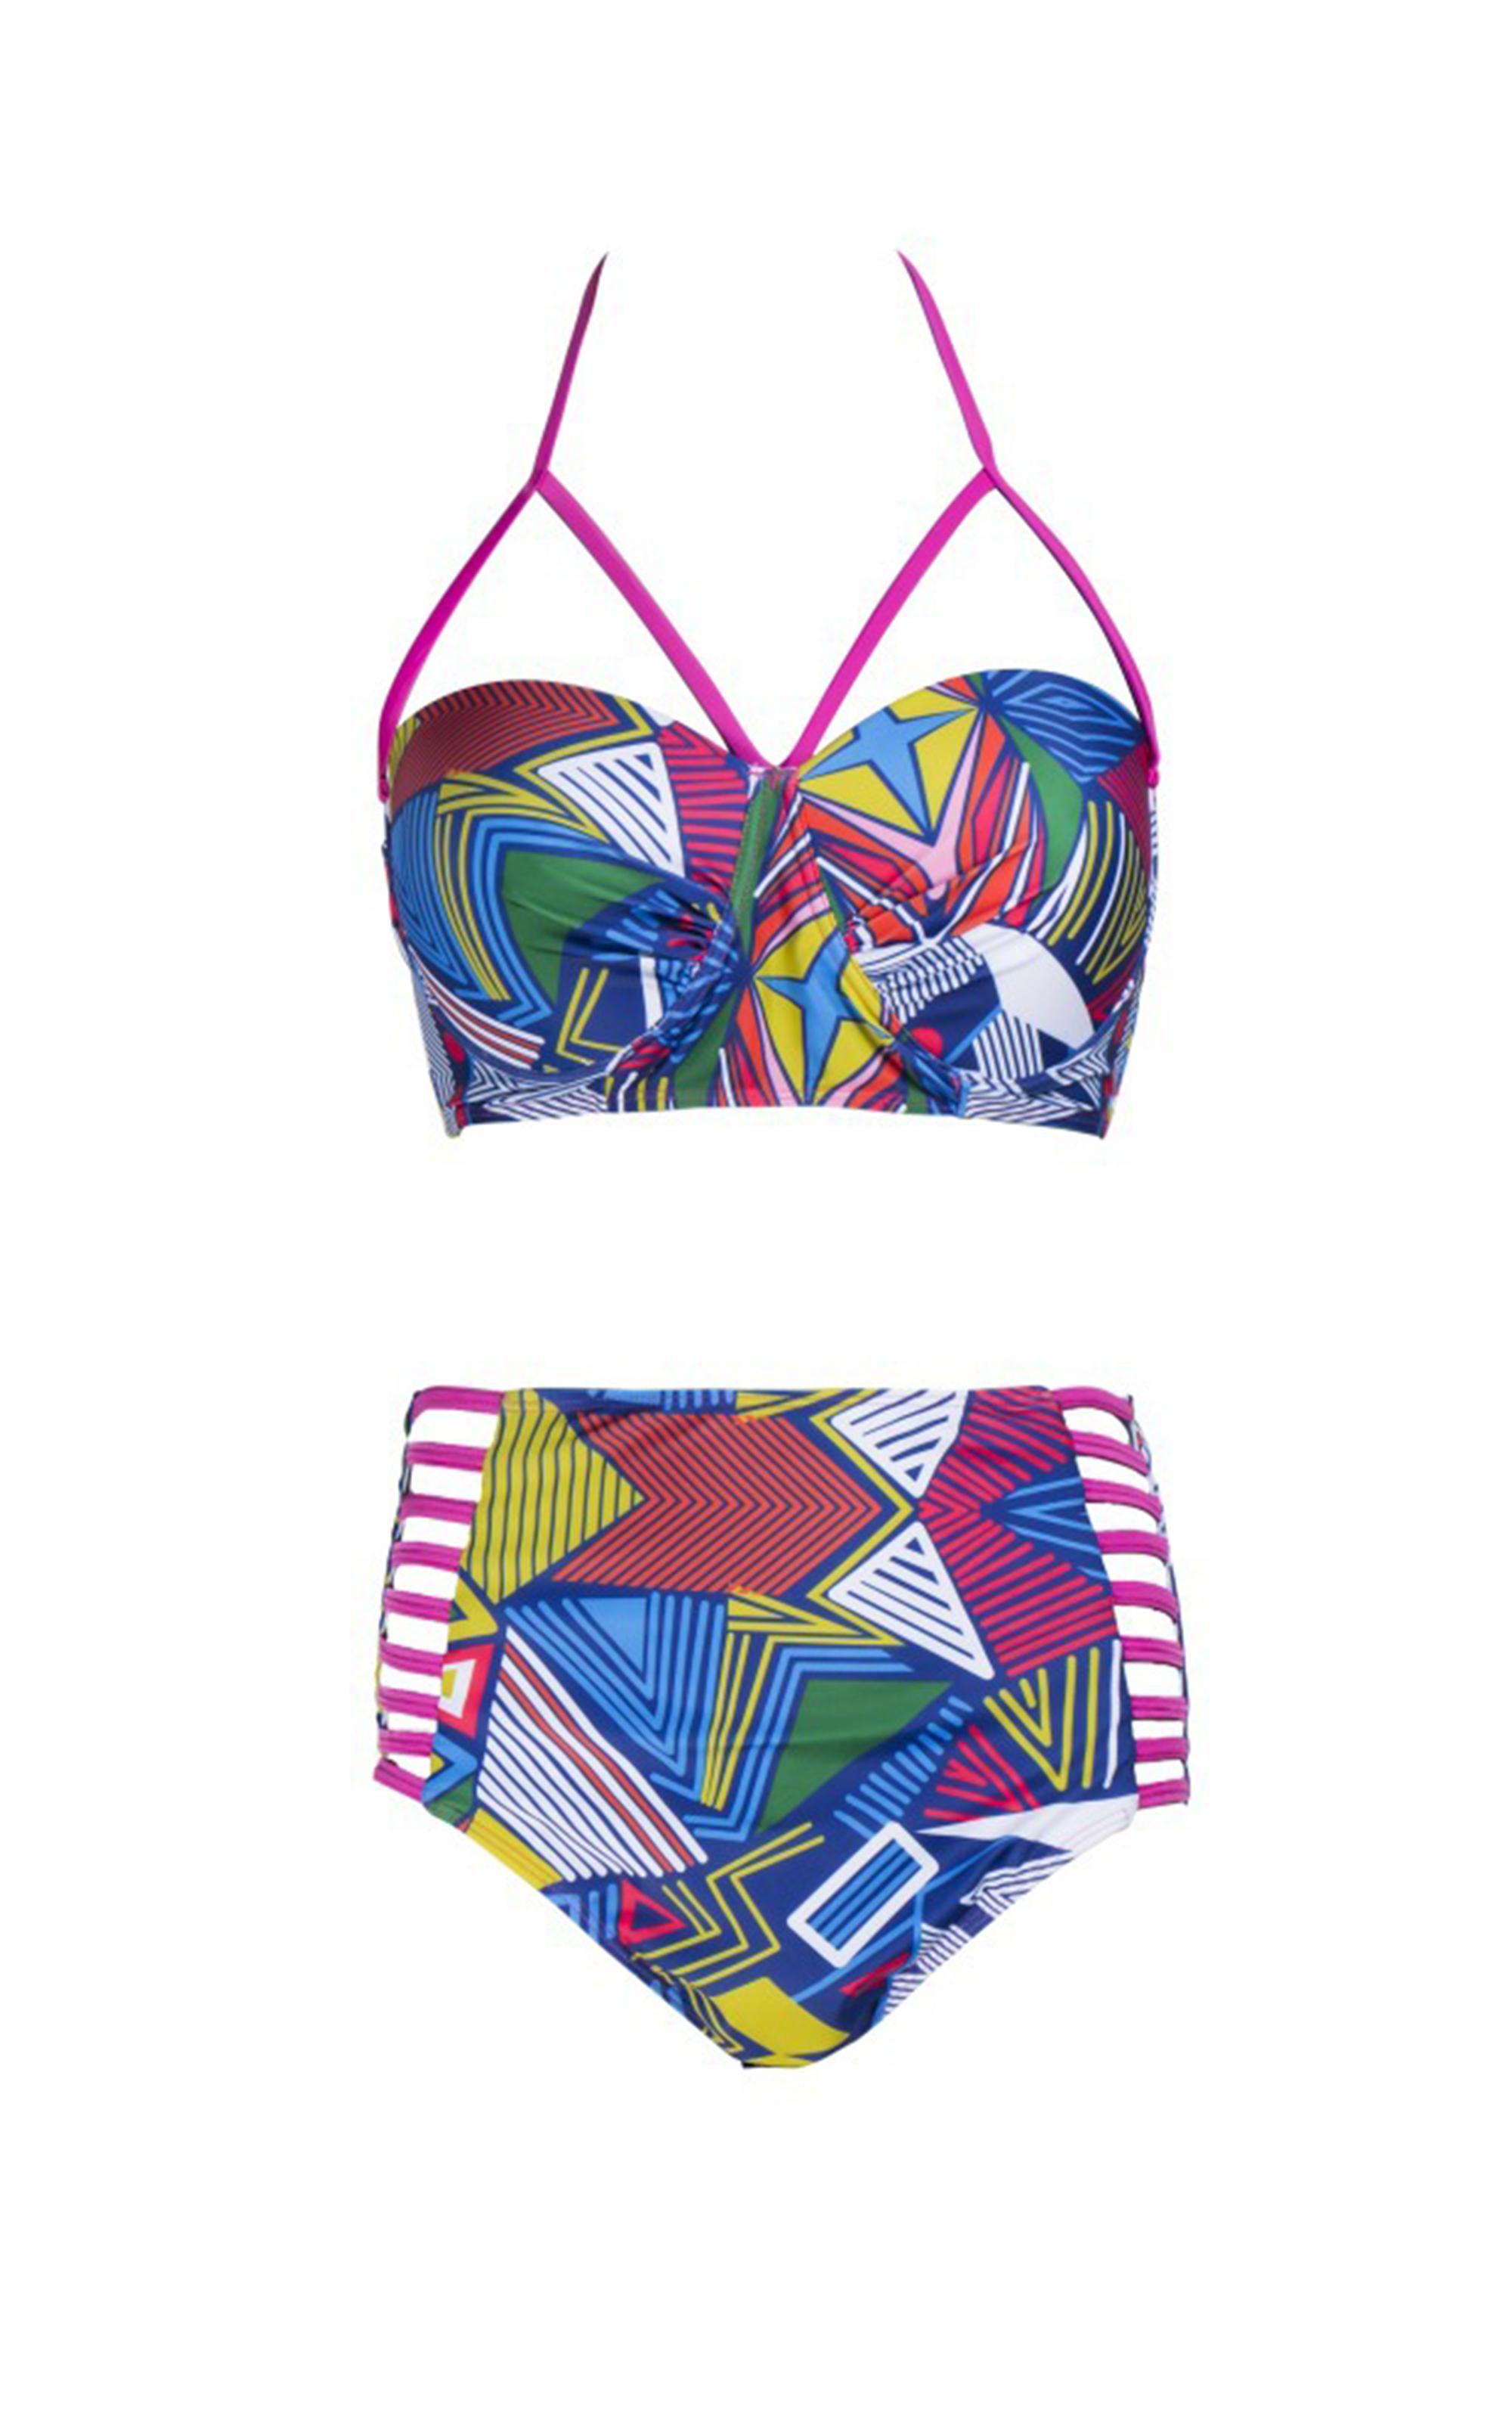 3ceace5c40f Plus Size Swimwear High Waisted Bikini Swimsuits for Big Busts Girls -  Thumbnail 1 ...